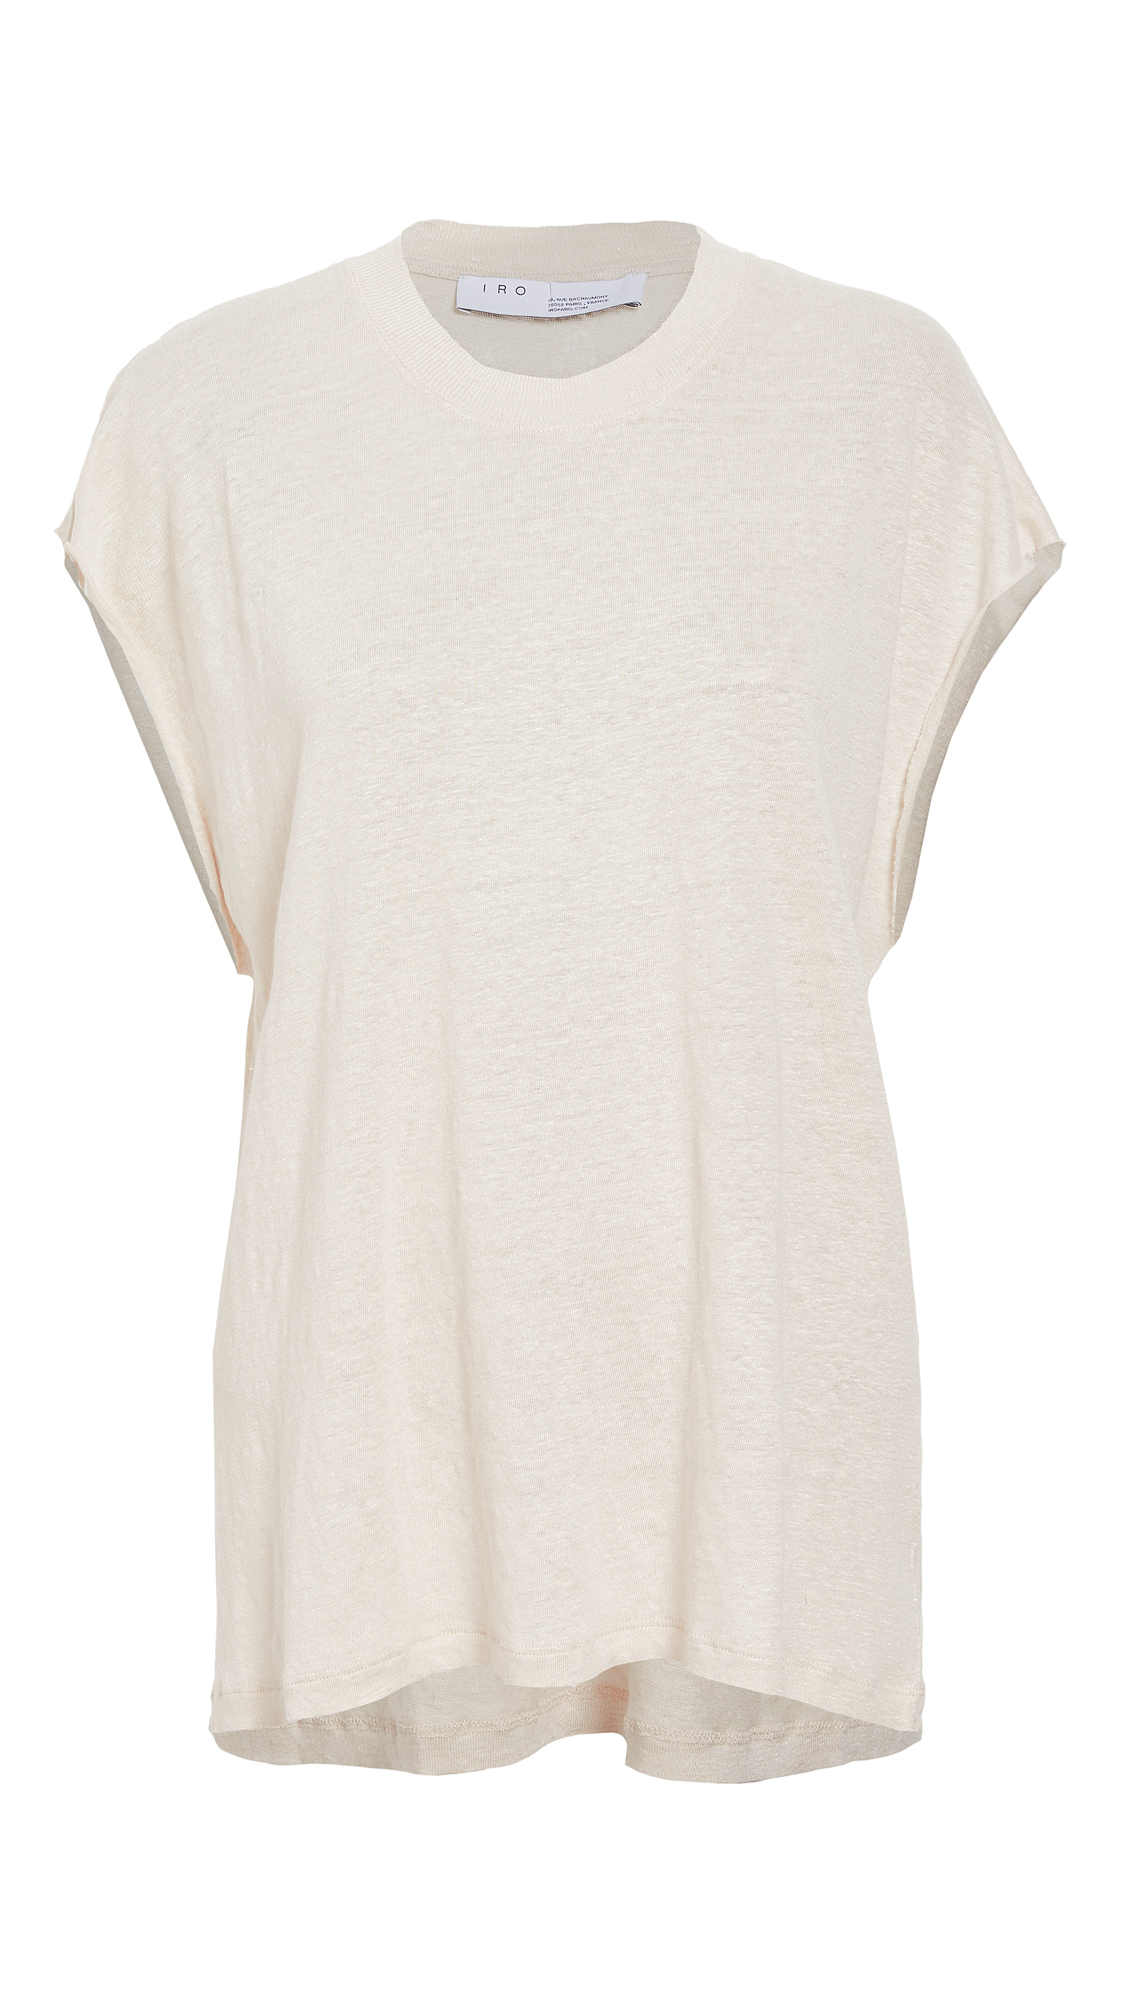 IRO Windy T-Shirt